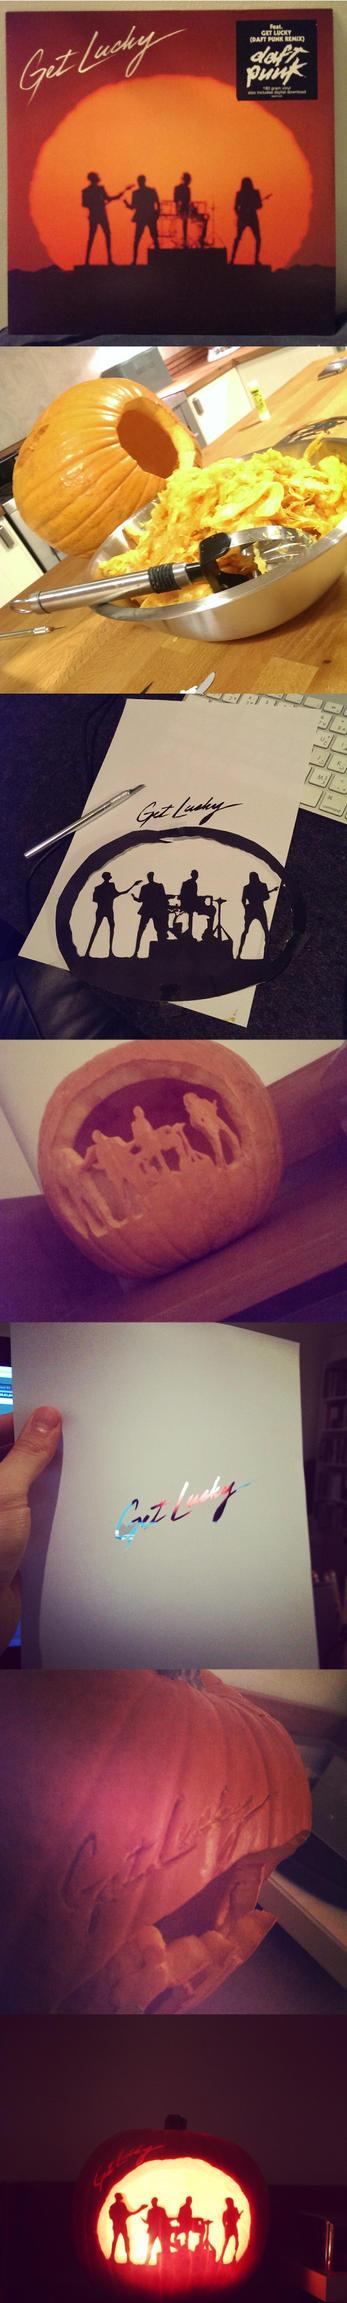 Getlucky-pumpkin by system-s